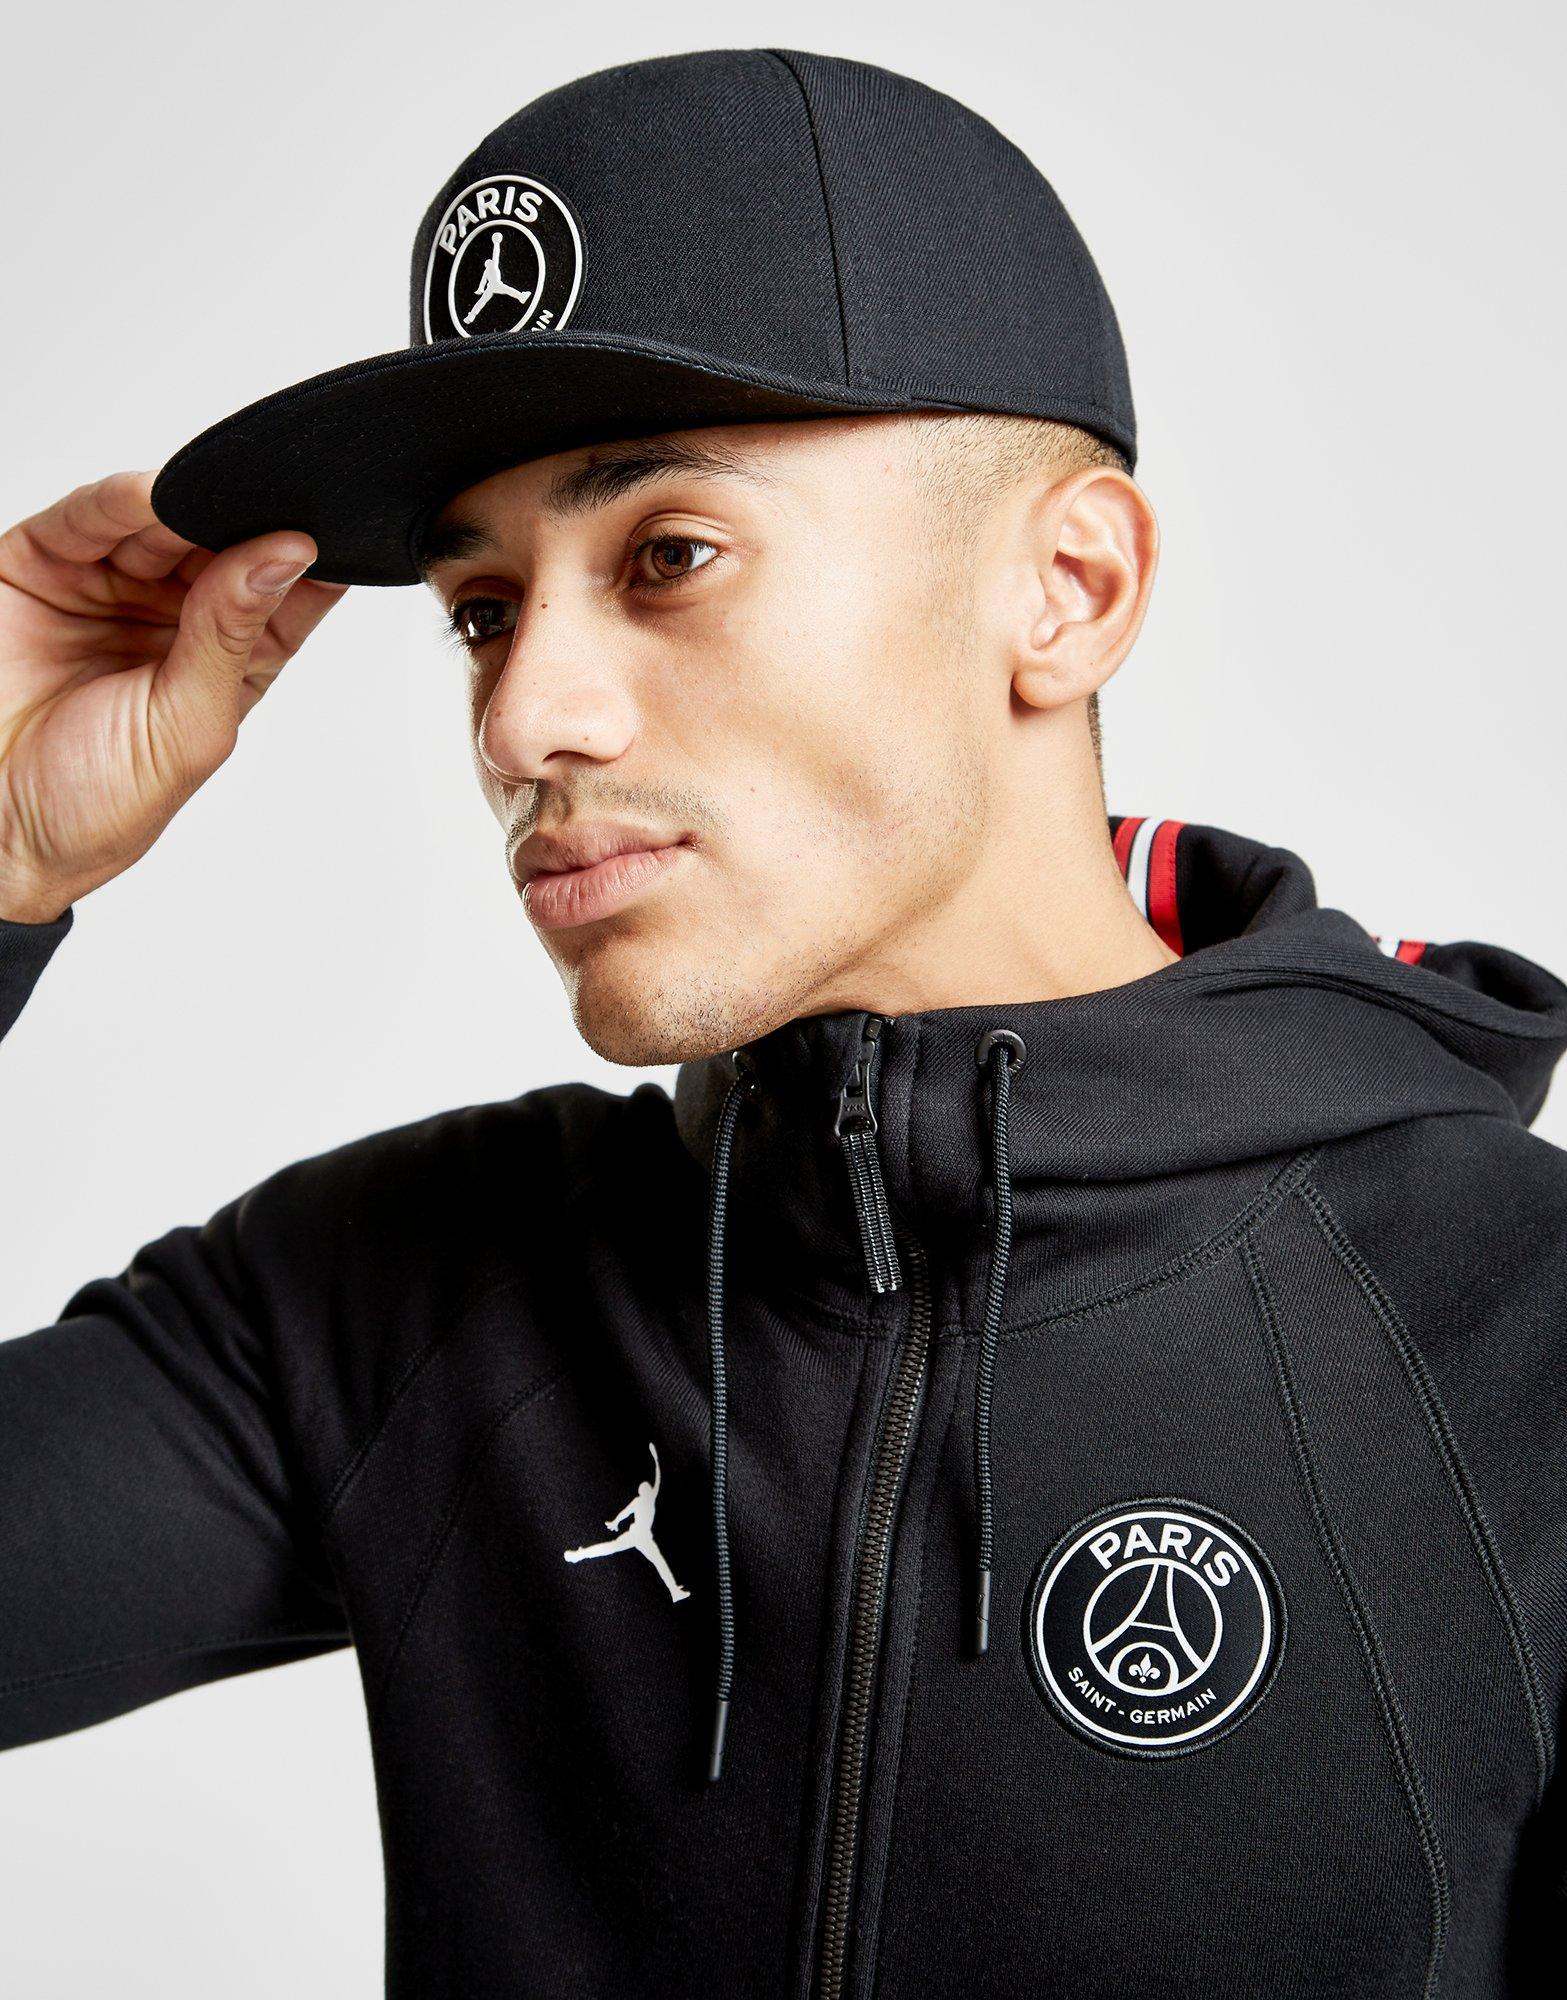 a156db0a8e2 Nike X Paris Saint Germain Wings Full Zip Hoodie in Black for Men - Lyst